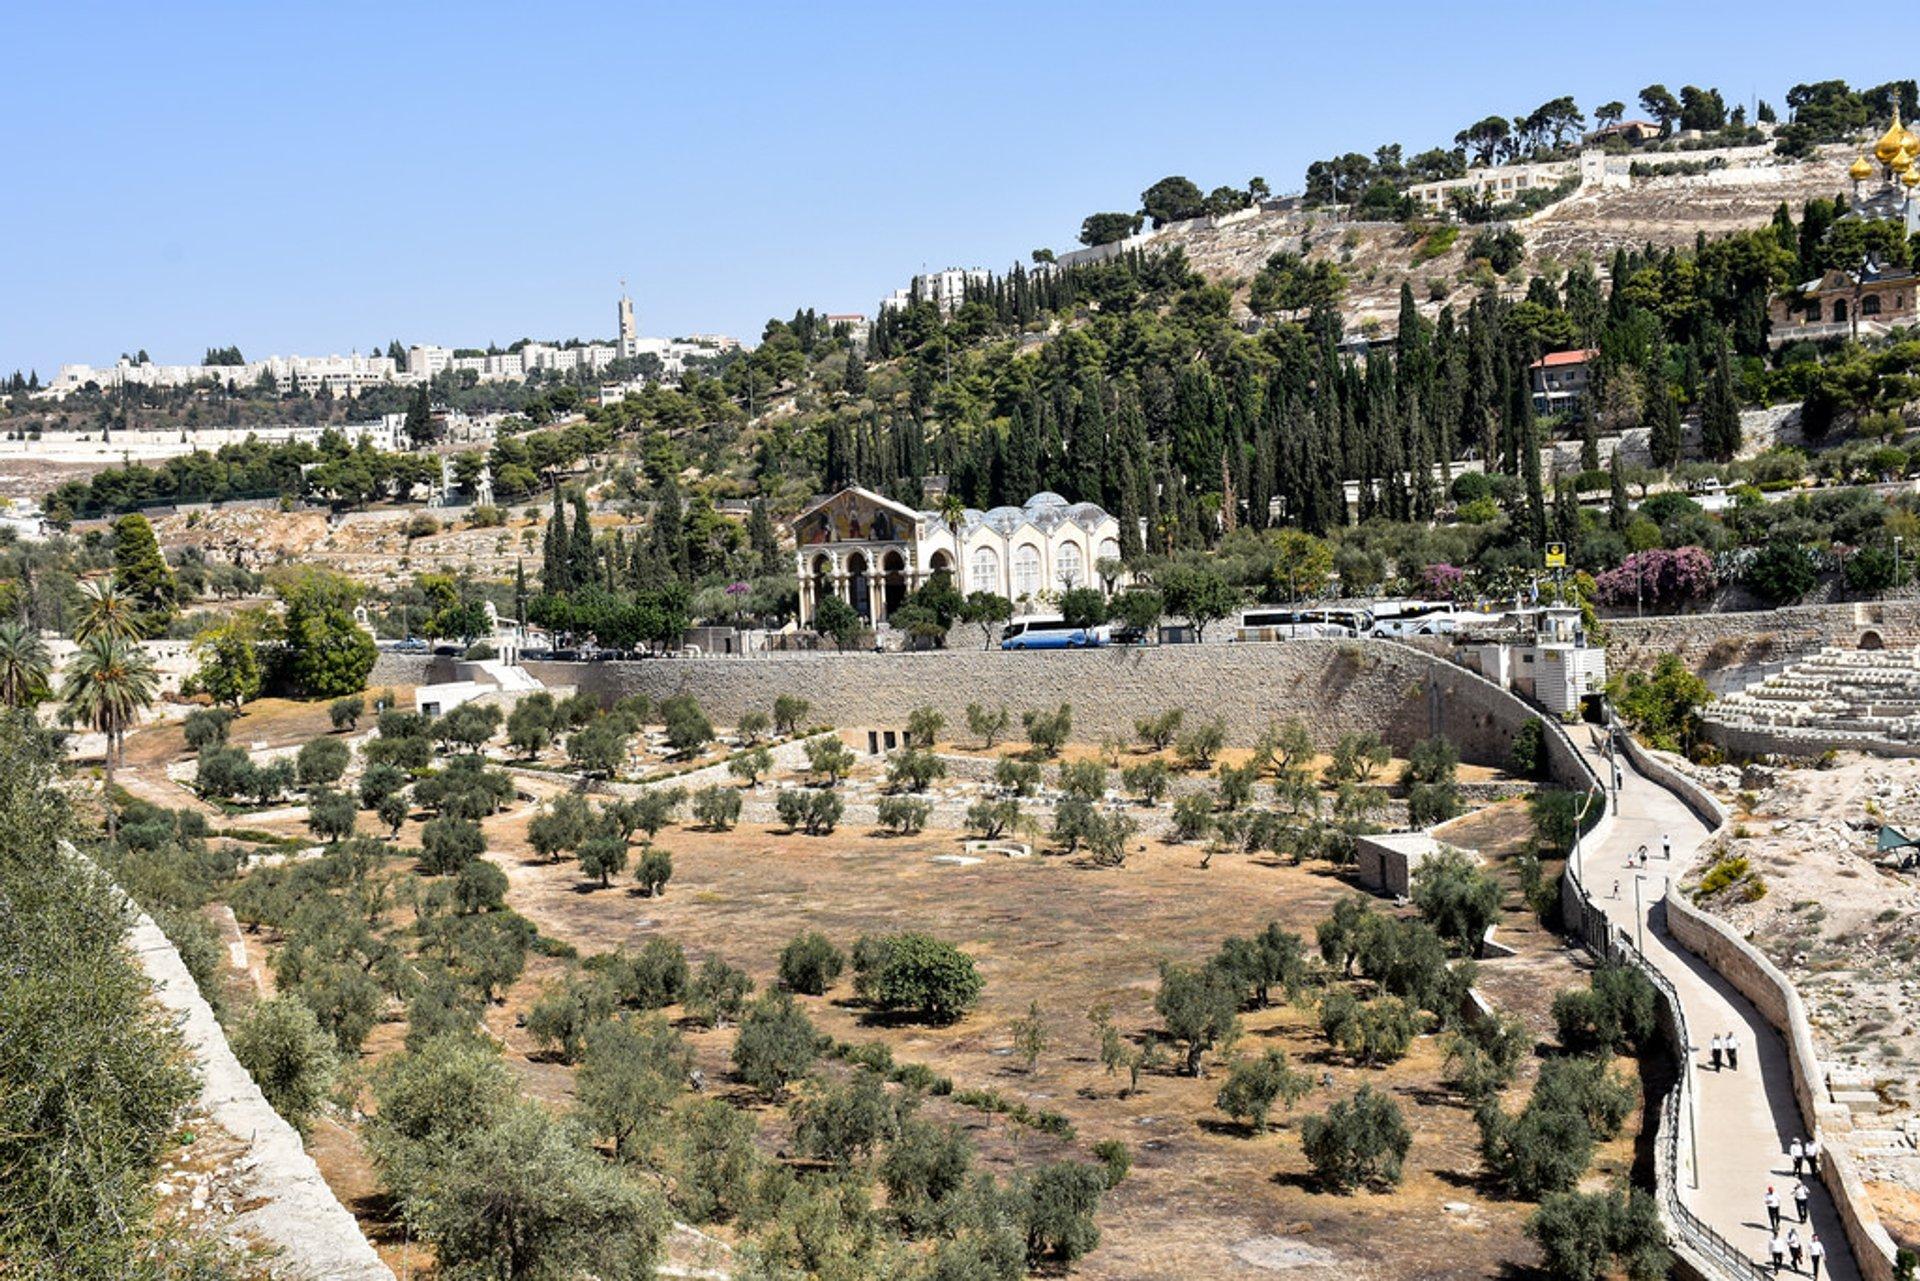 The Kidron Valley 2019